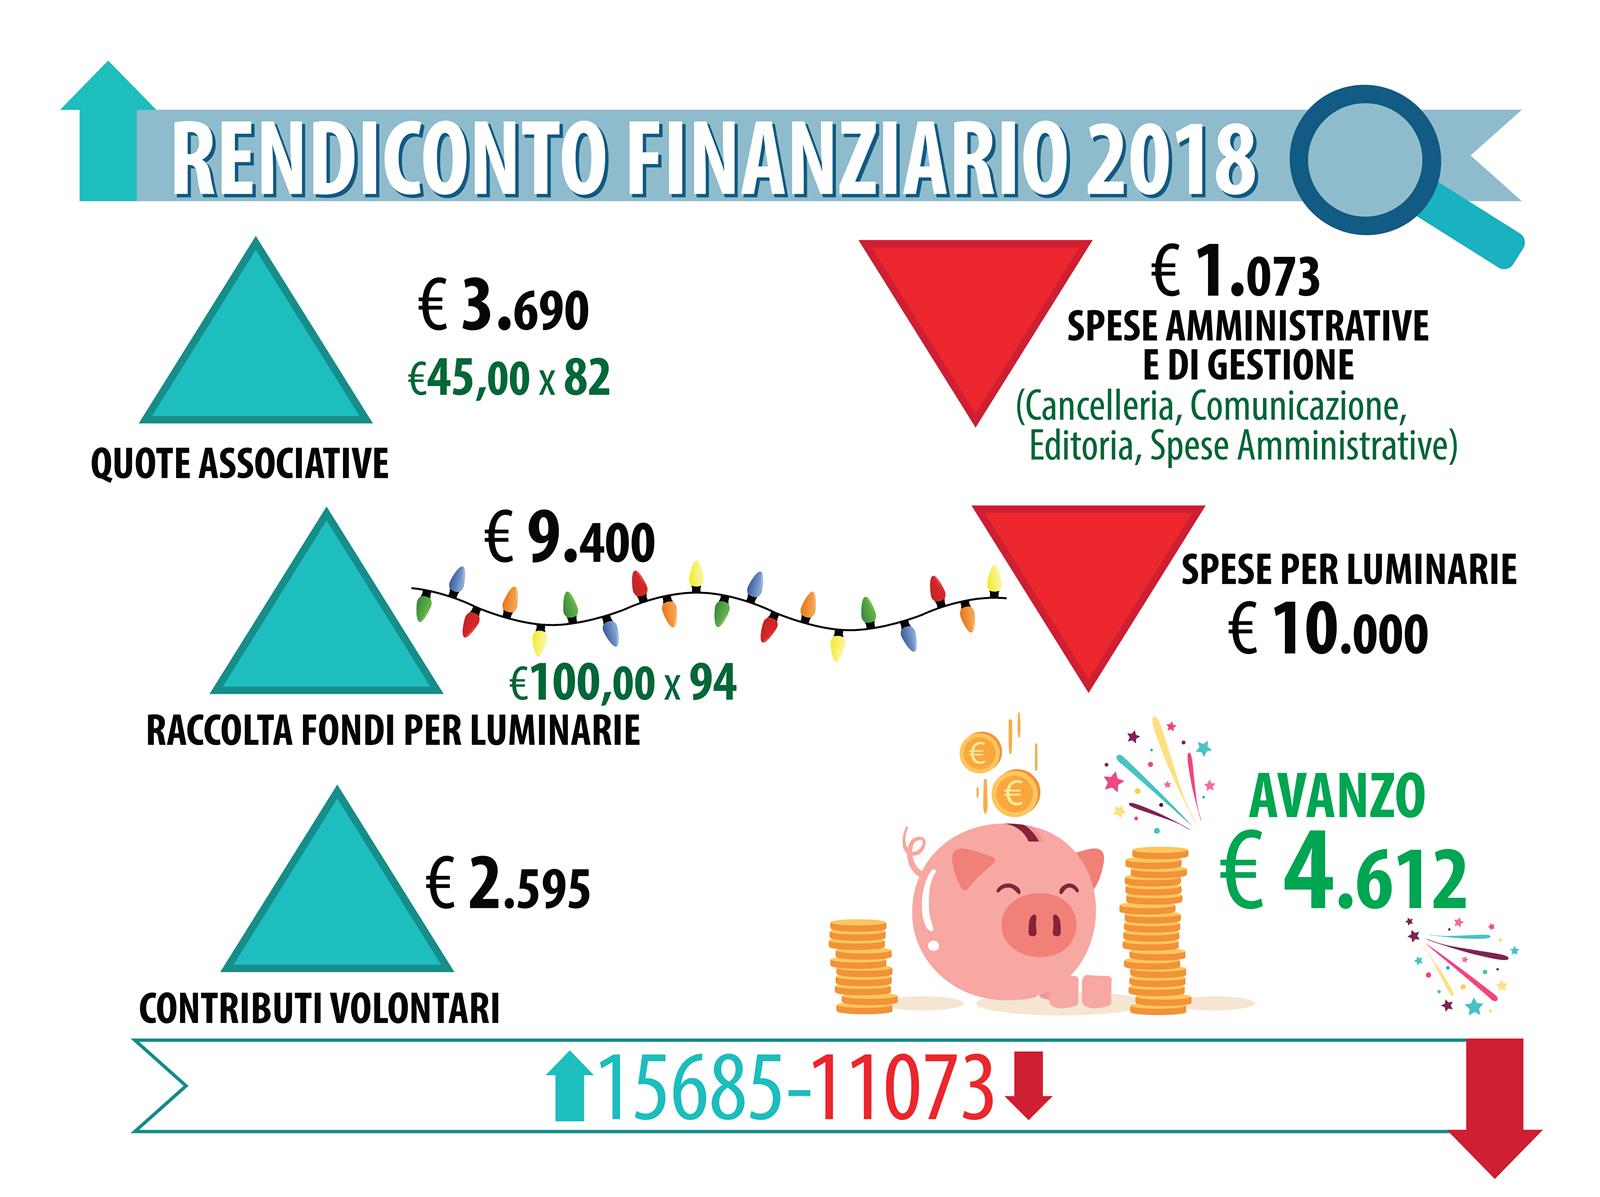 rendiconto finanziario 2018 AIC